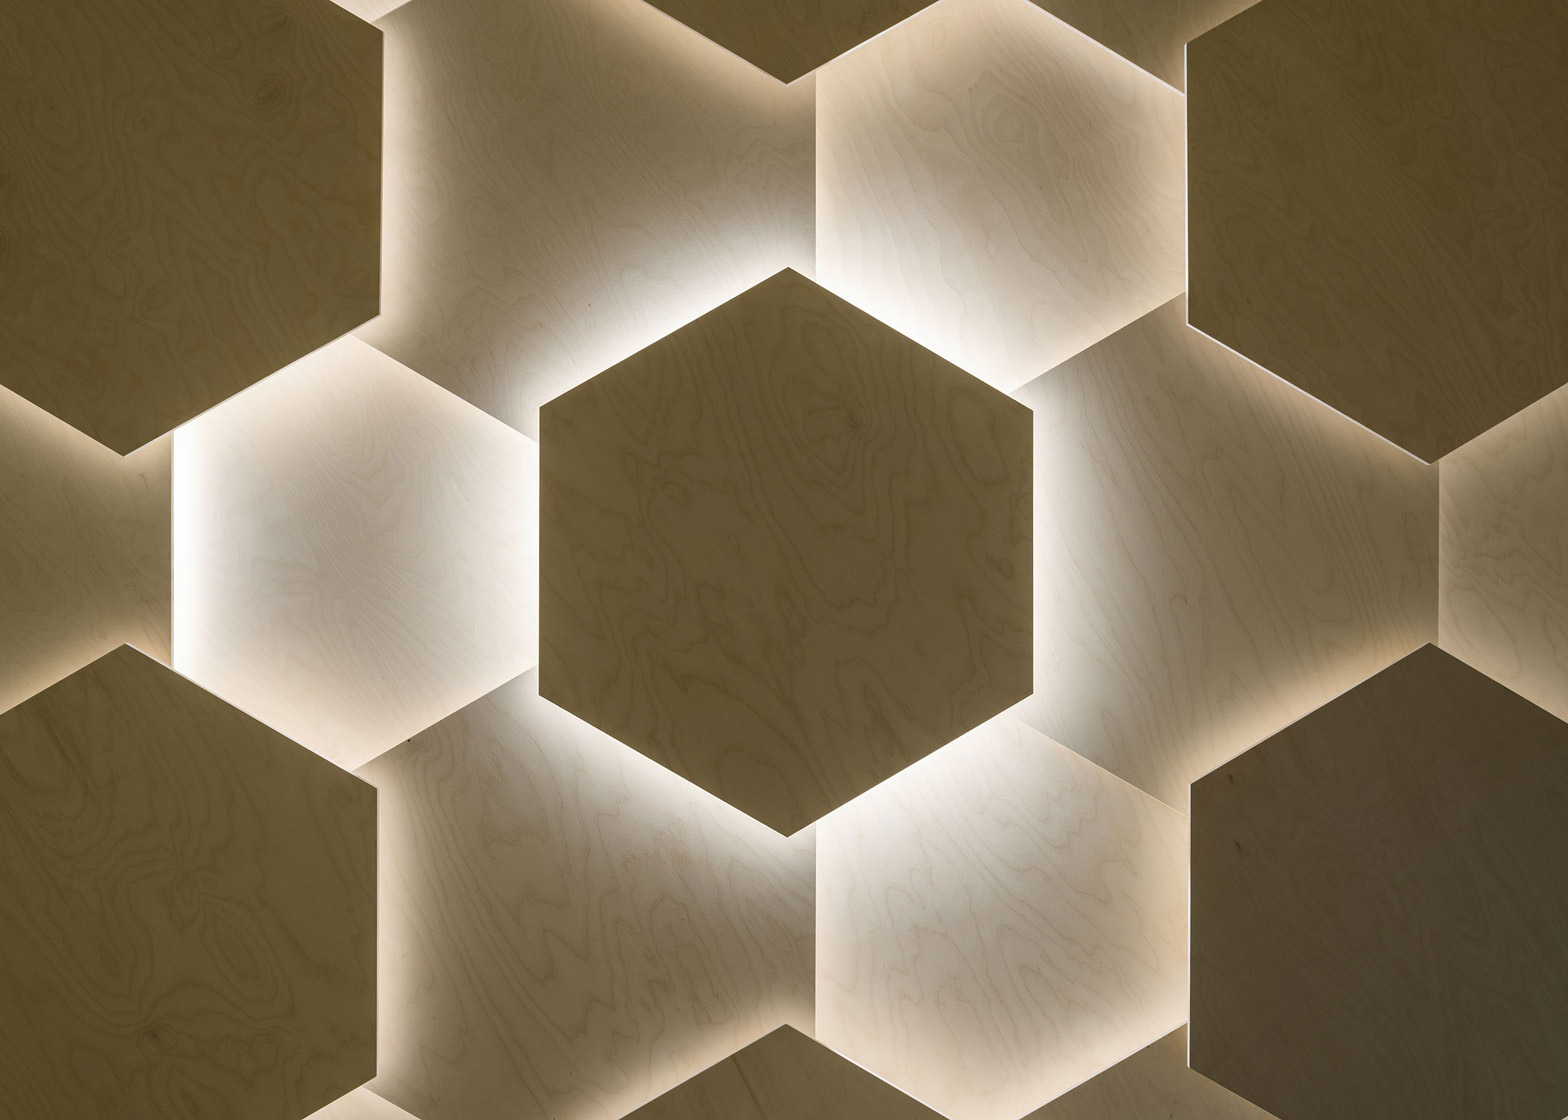 architecture_barber_shop_design_studia_interiors_osnovadesign_osnova_poltava_08